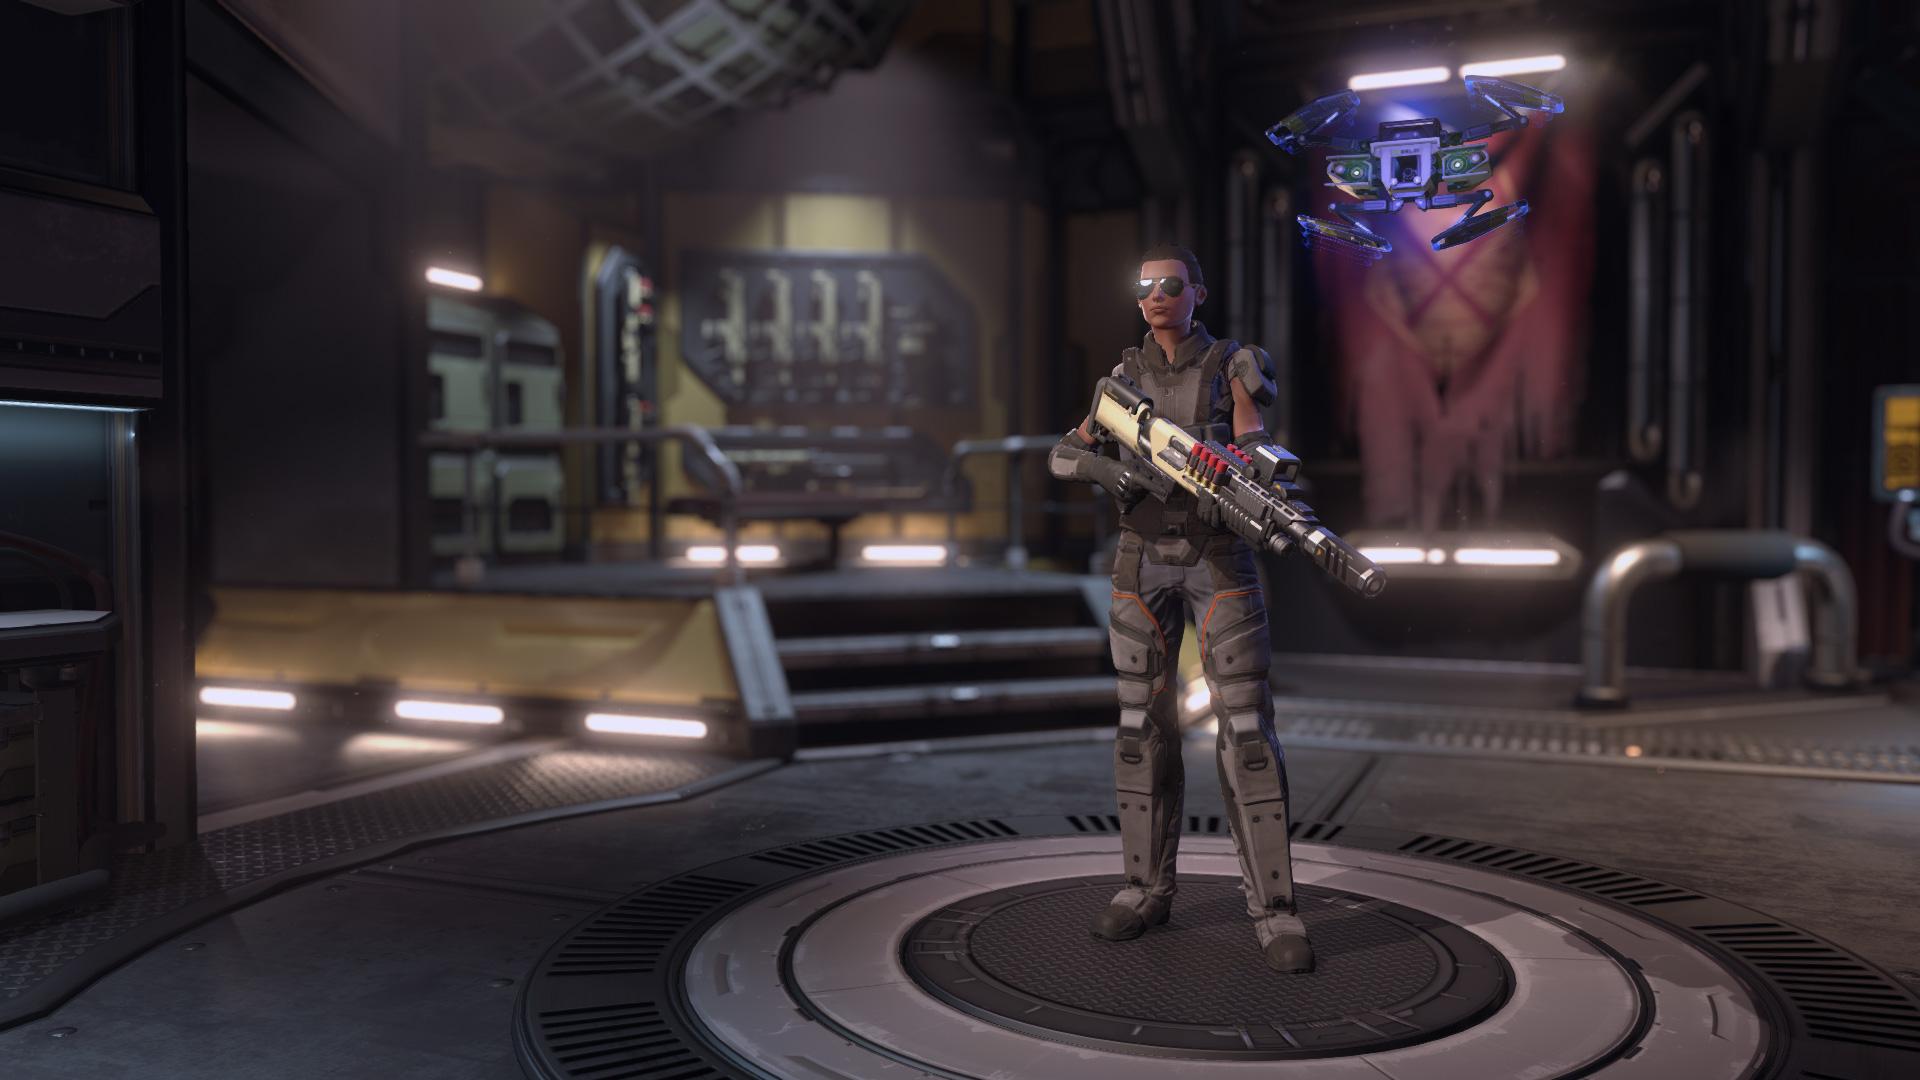 XCOM 2's Specialist is a Mix of Brains and Braw